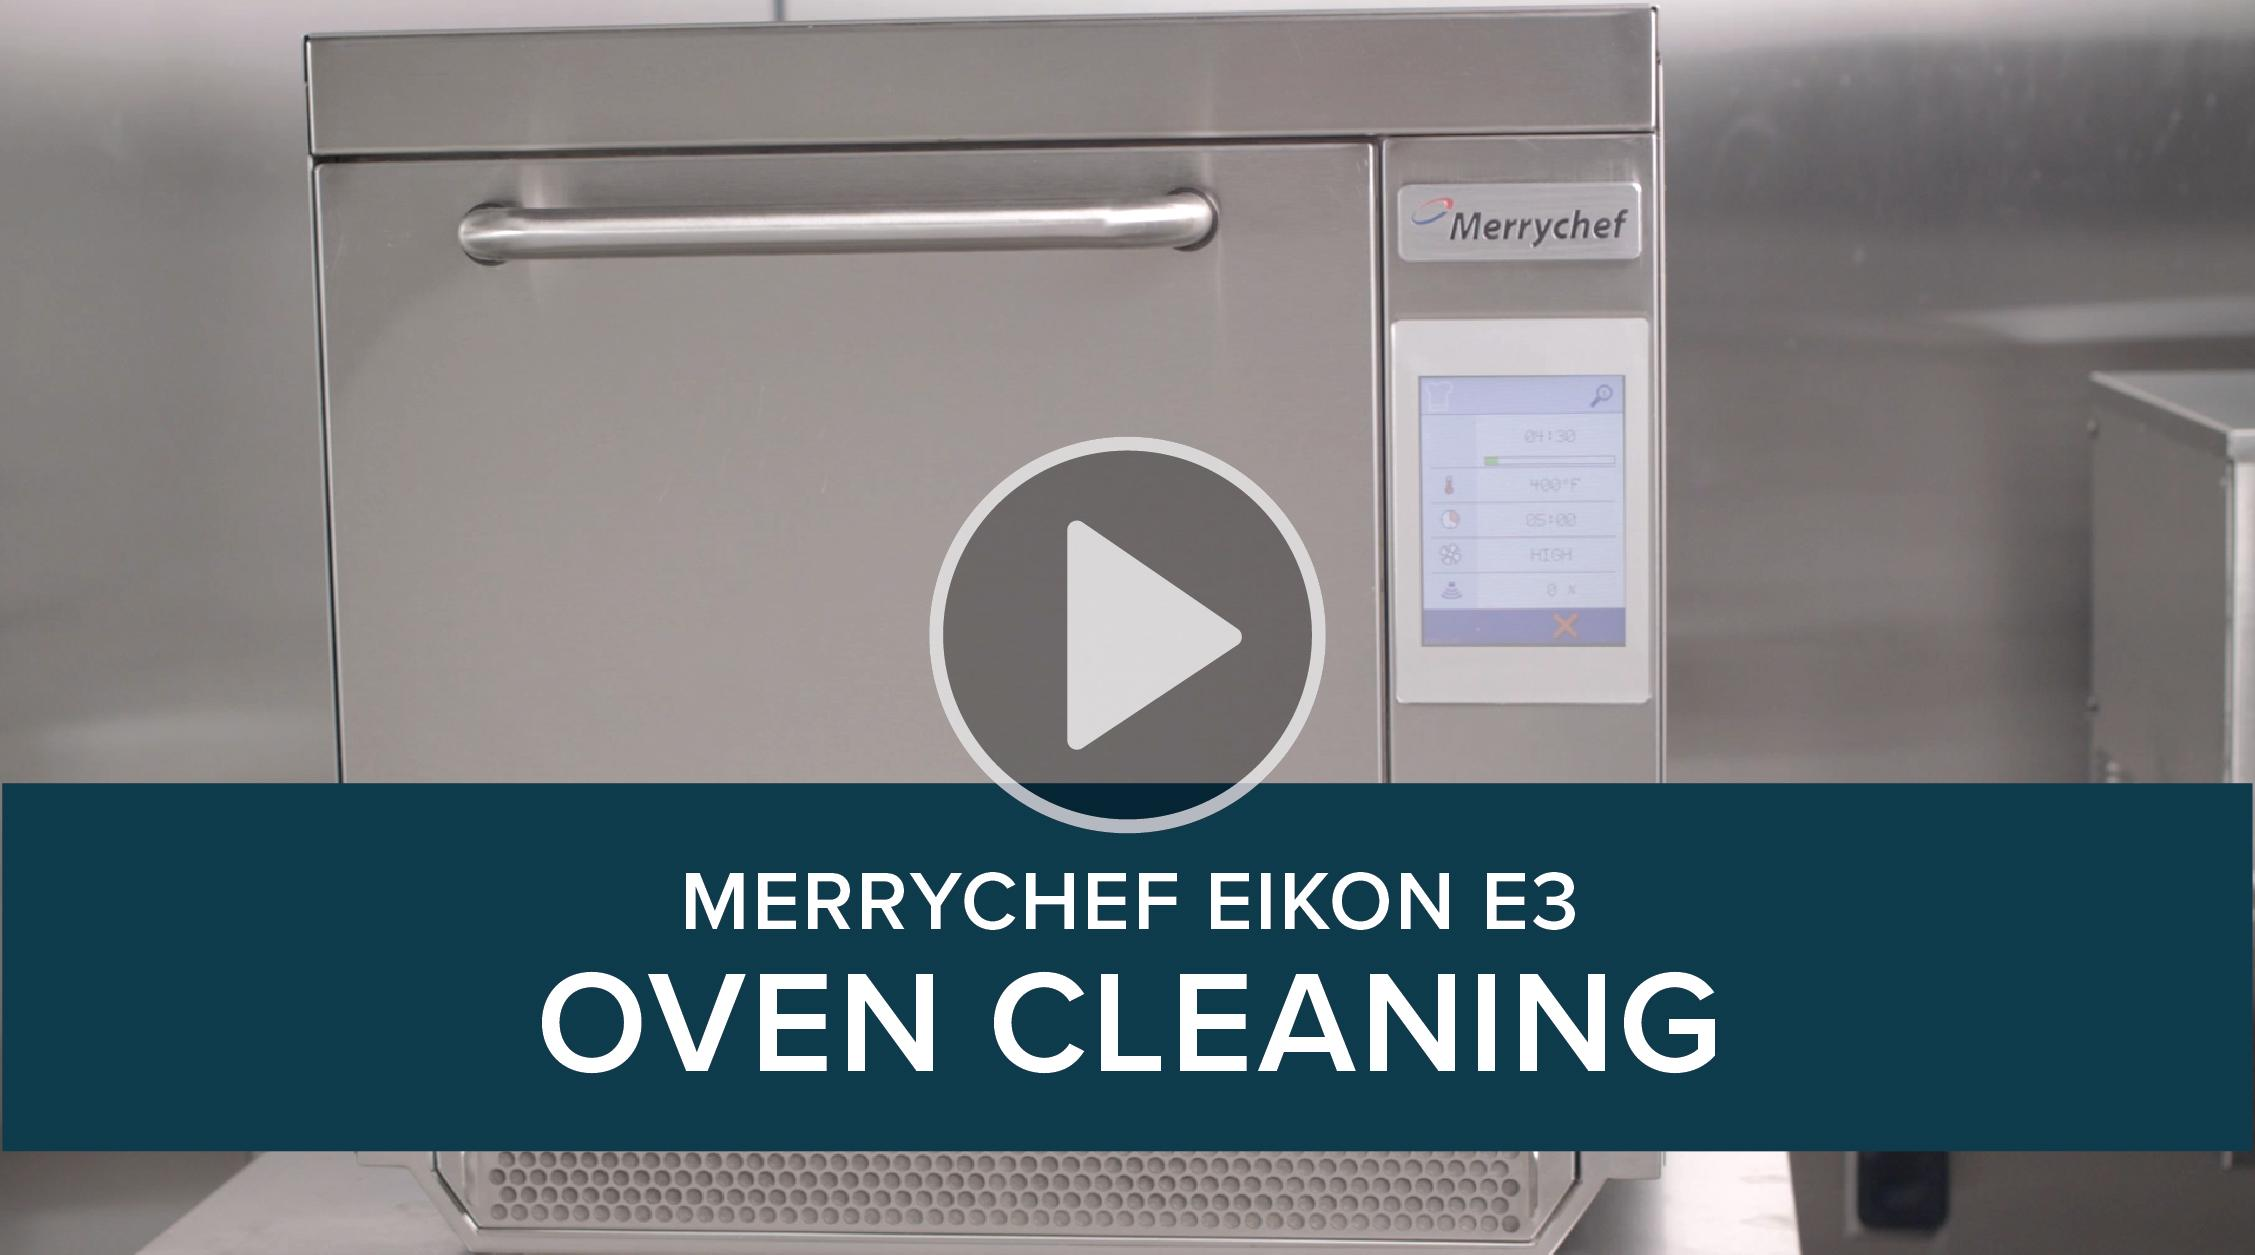 Merrychef Eikon E3 Cleaning Process